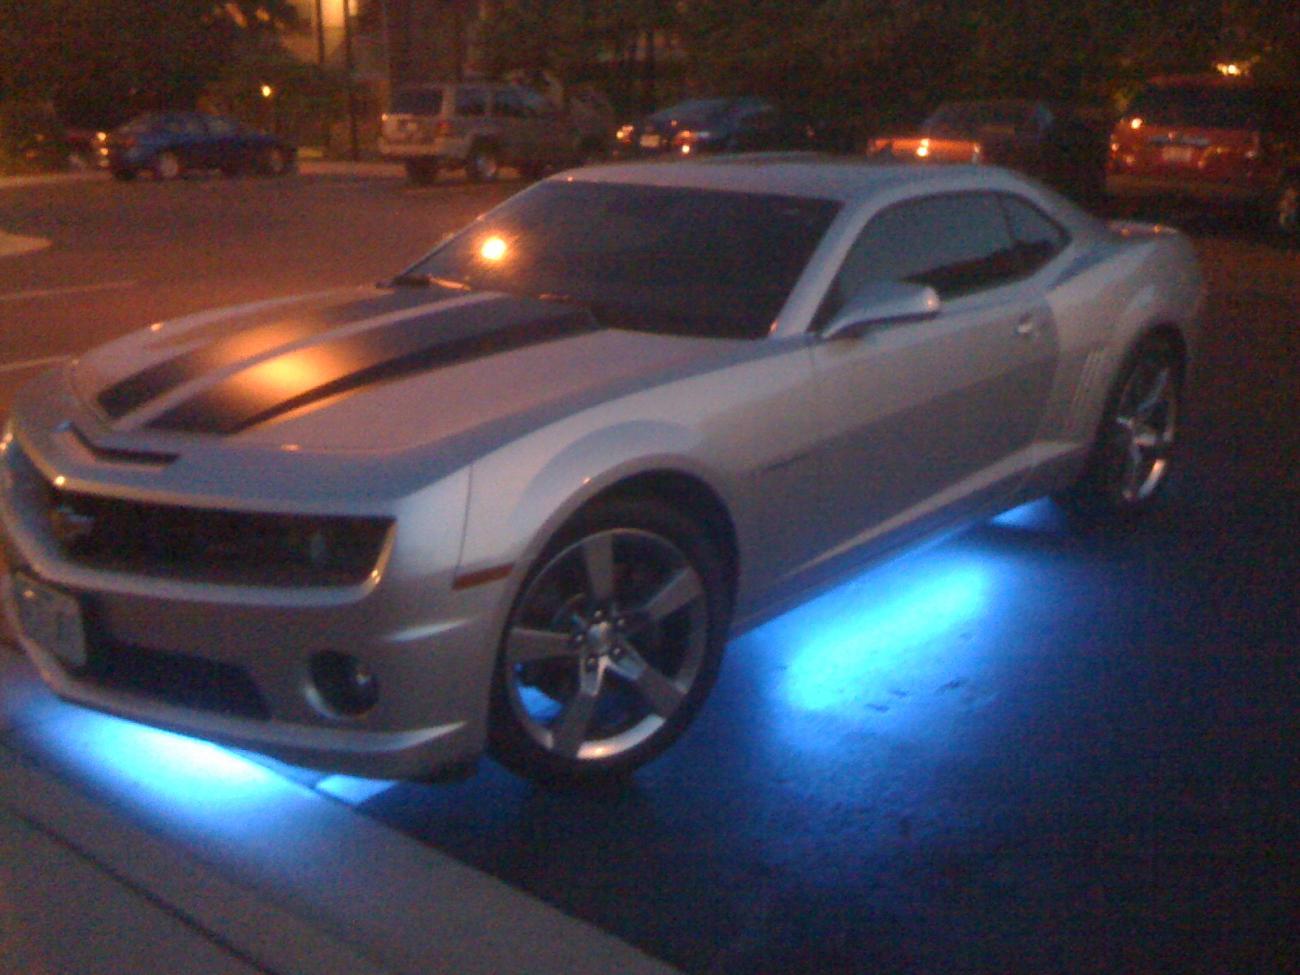 Just Added Blue Neon Underglow To My 2ss Camaro5 Chevy Camaro Forum Camaro Zl1 Ss And V6